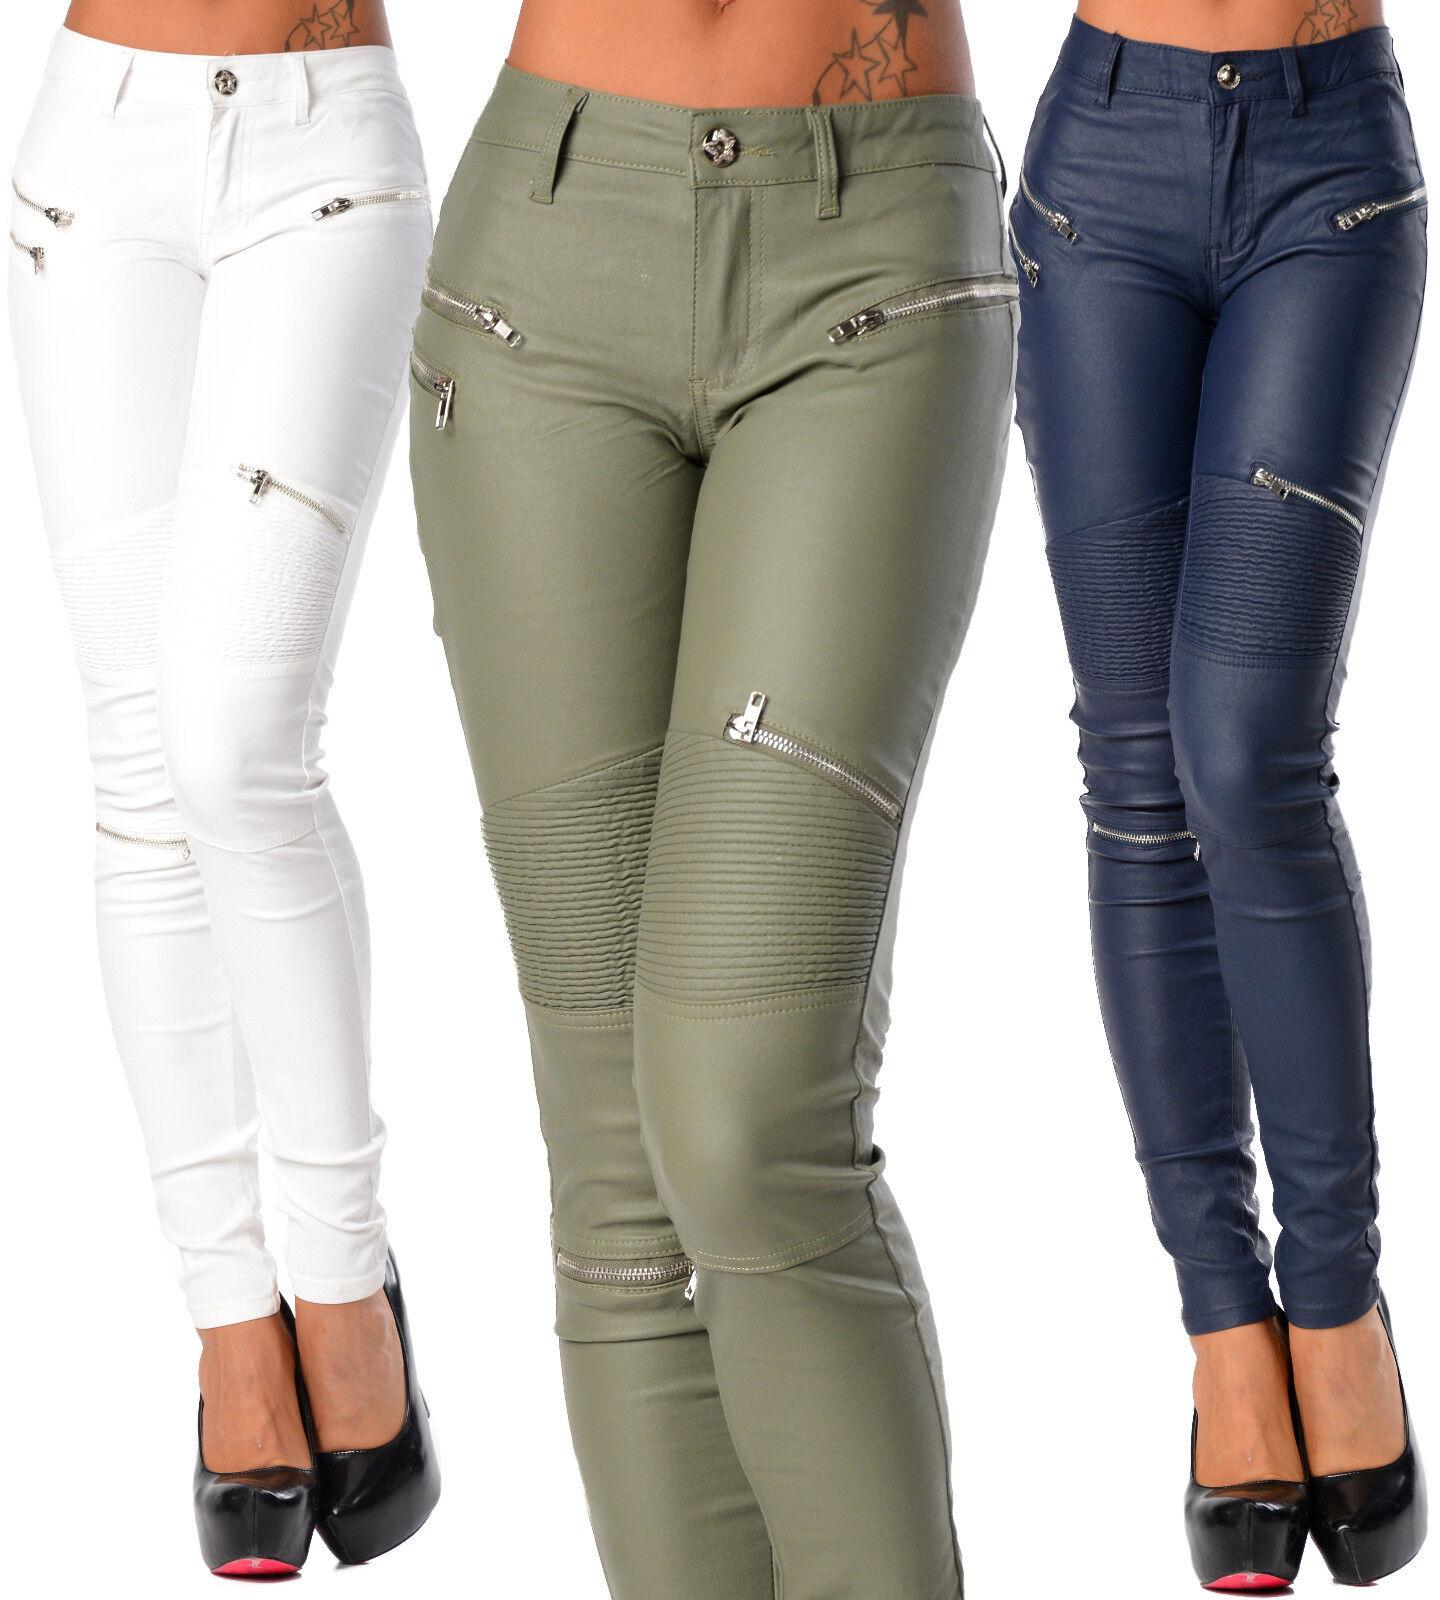 Sexy Damen Enge Jeans Hose Hüfthose Nass Biker-Look mit Reißverschluss K 275